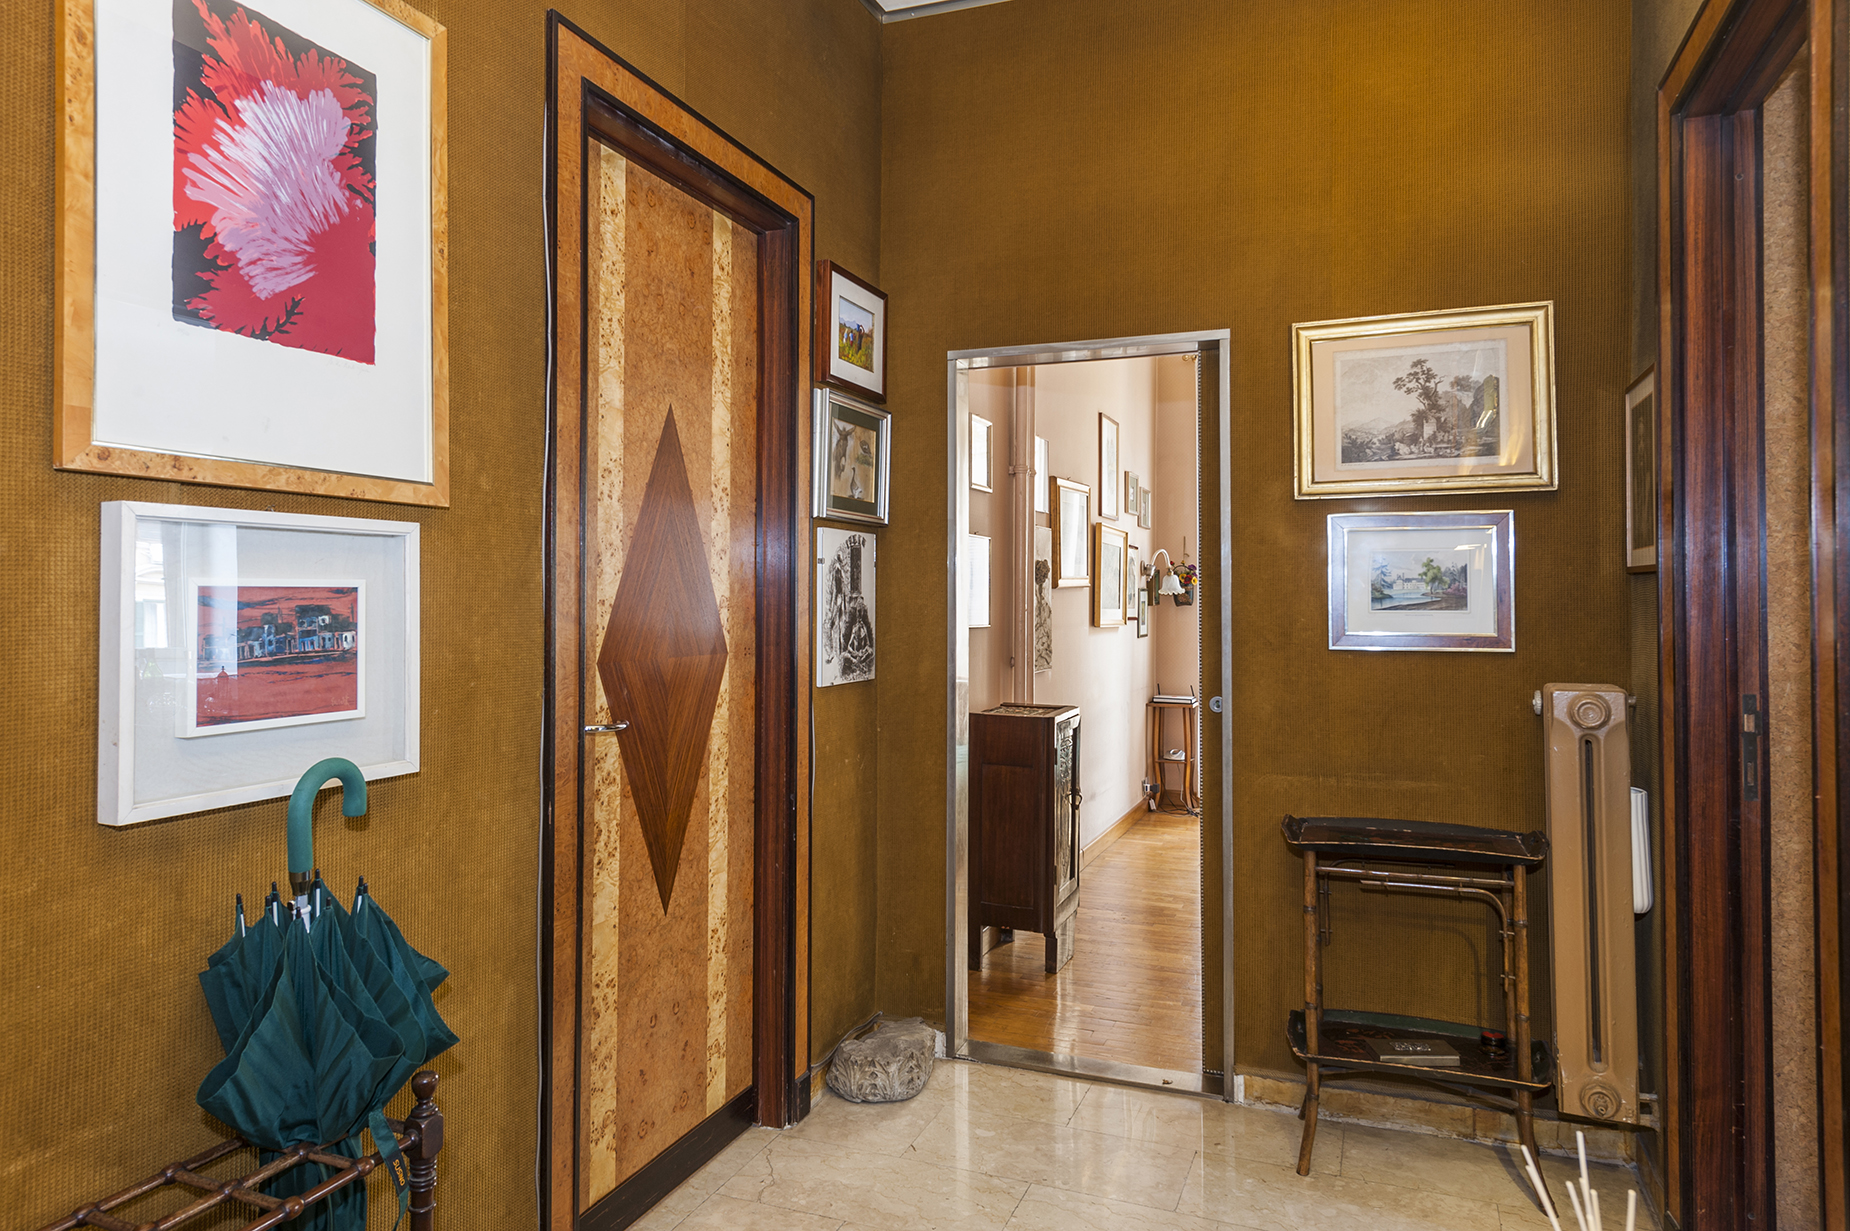 Additional photo for property listing at Elegant apartment in the Prati neighborhood Via Crescenzio Rome, Rome 00193 Italy